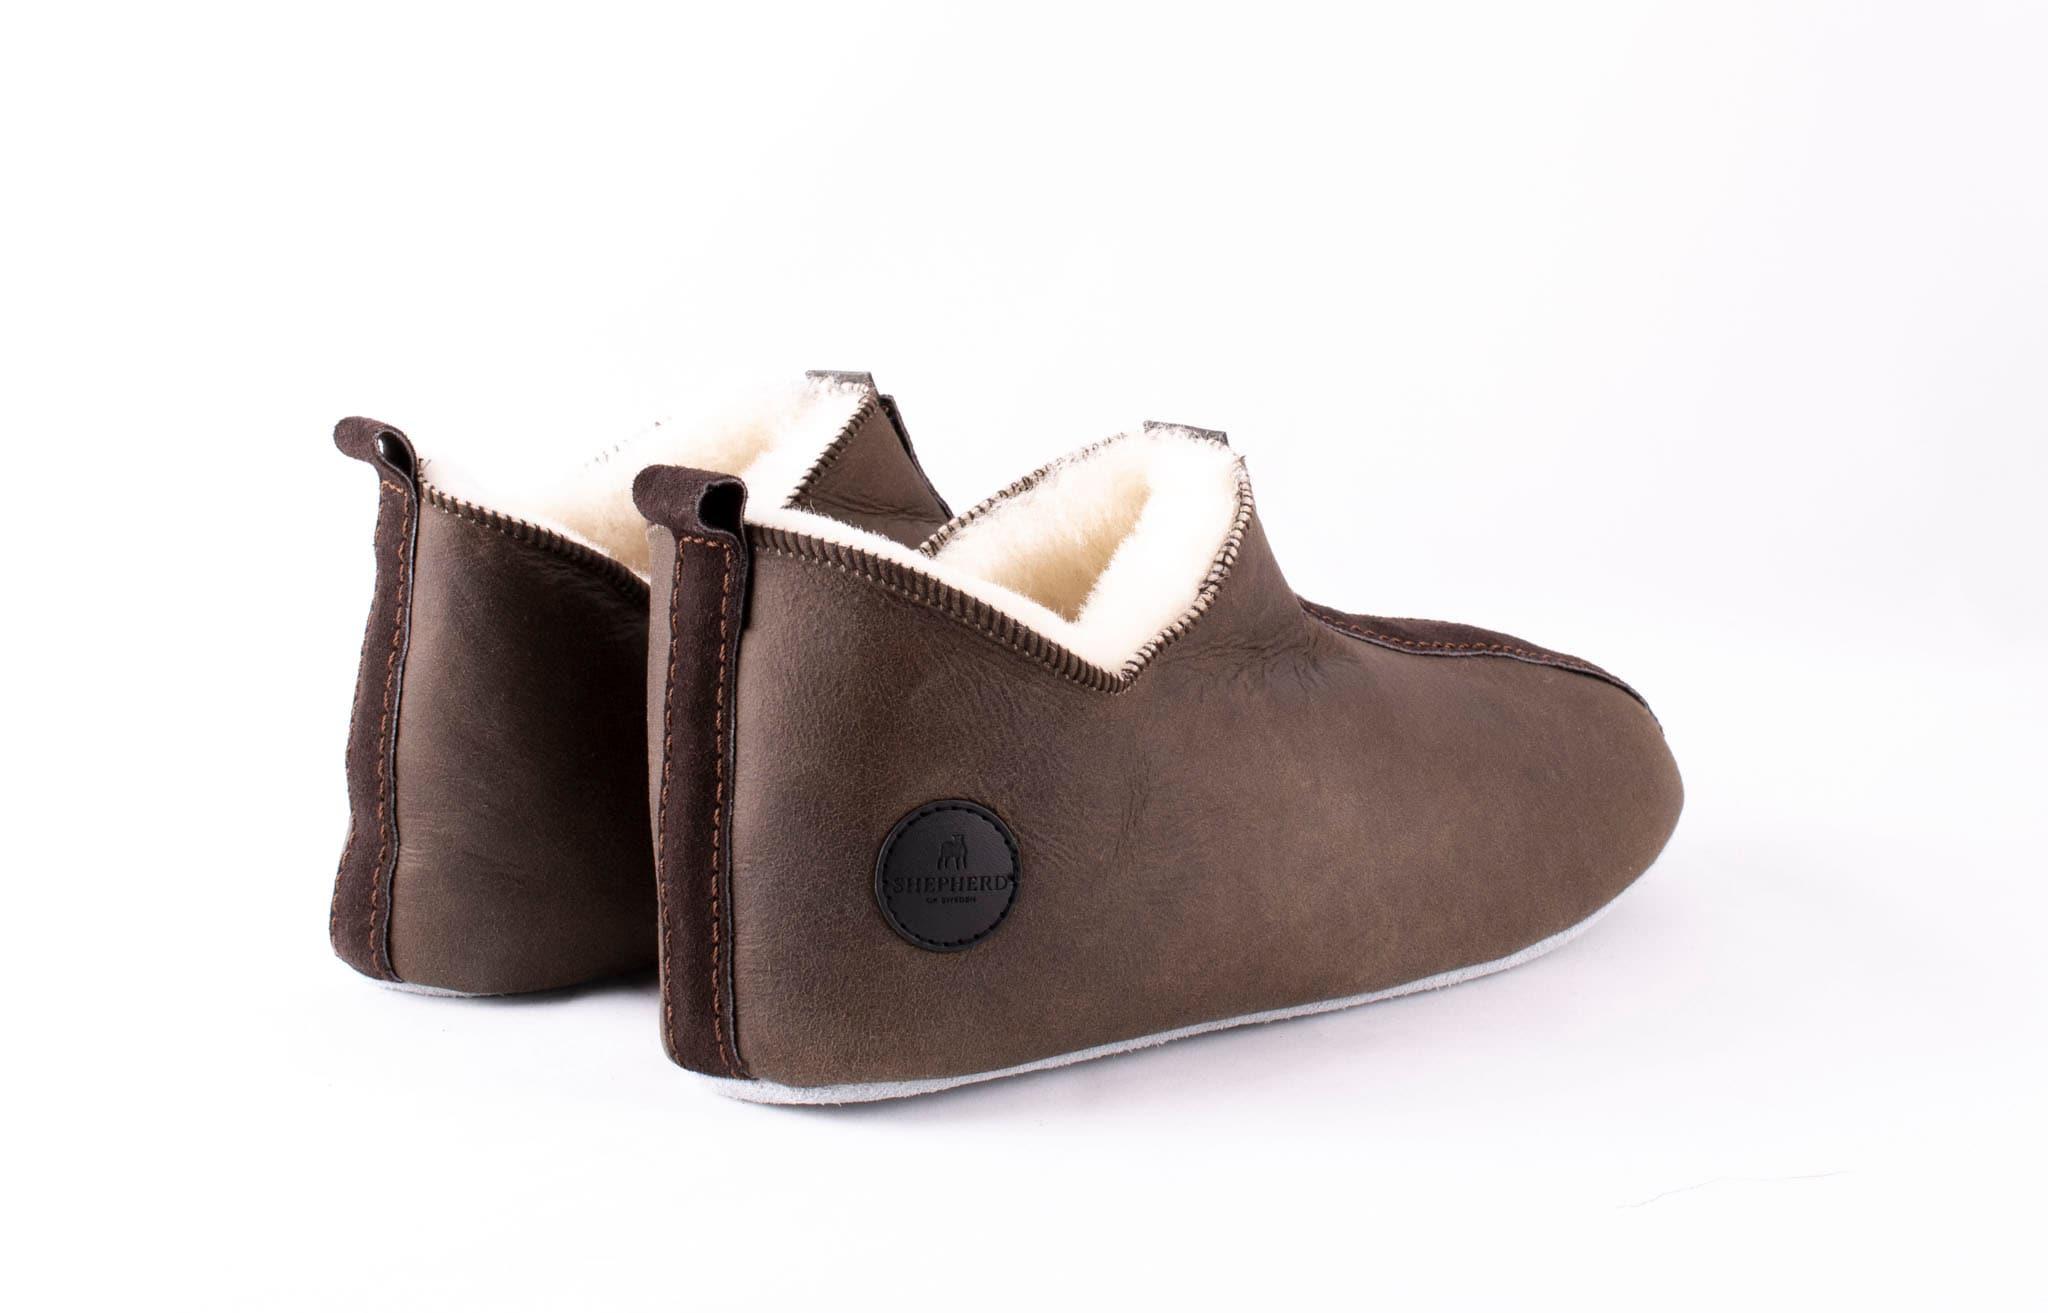 Lina sheepskin slippers